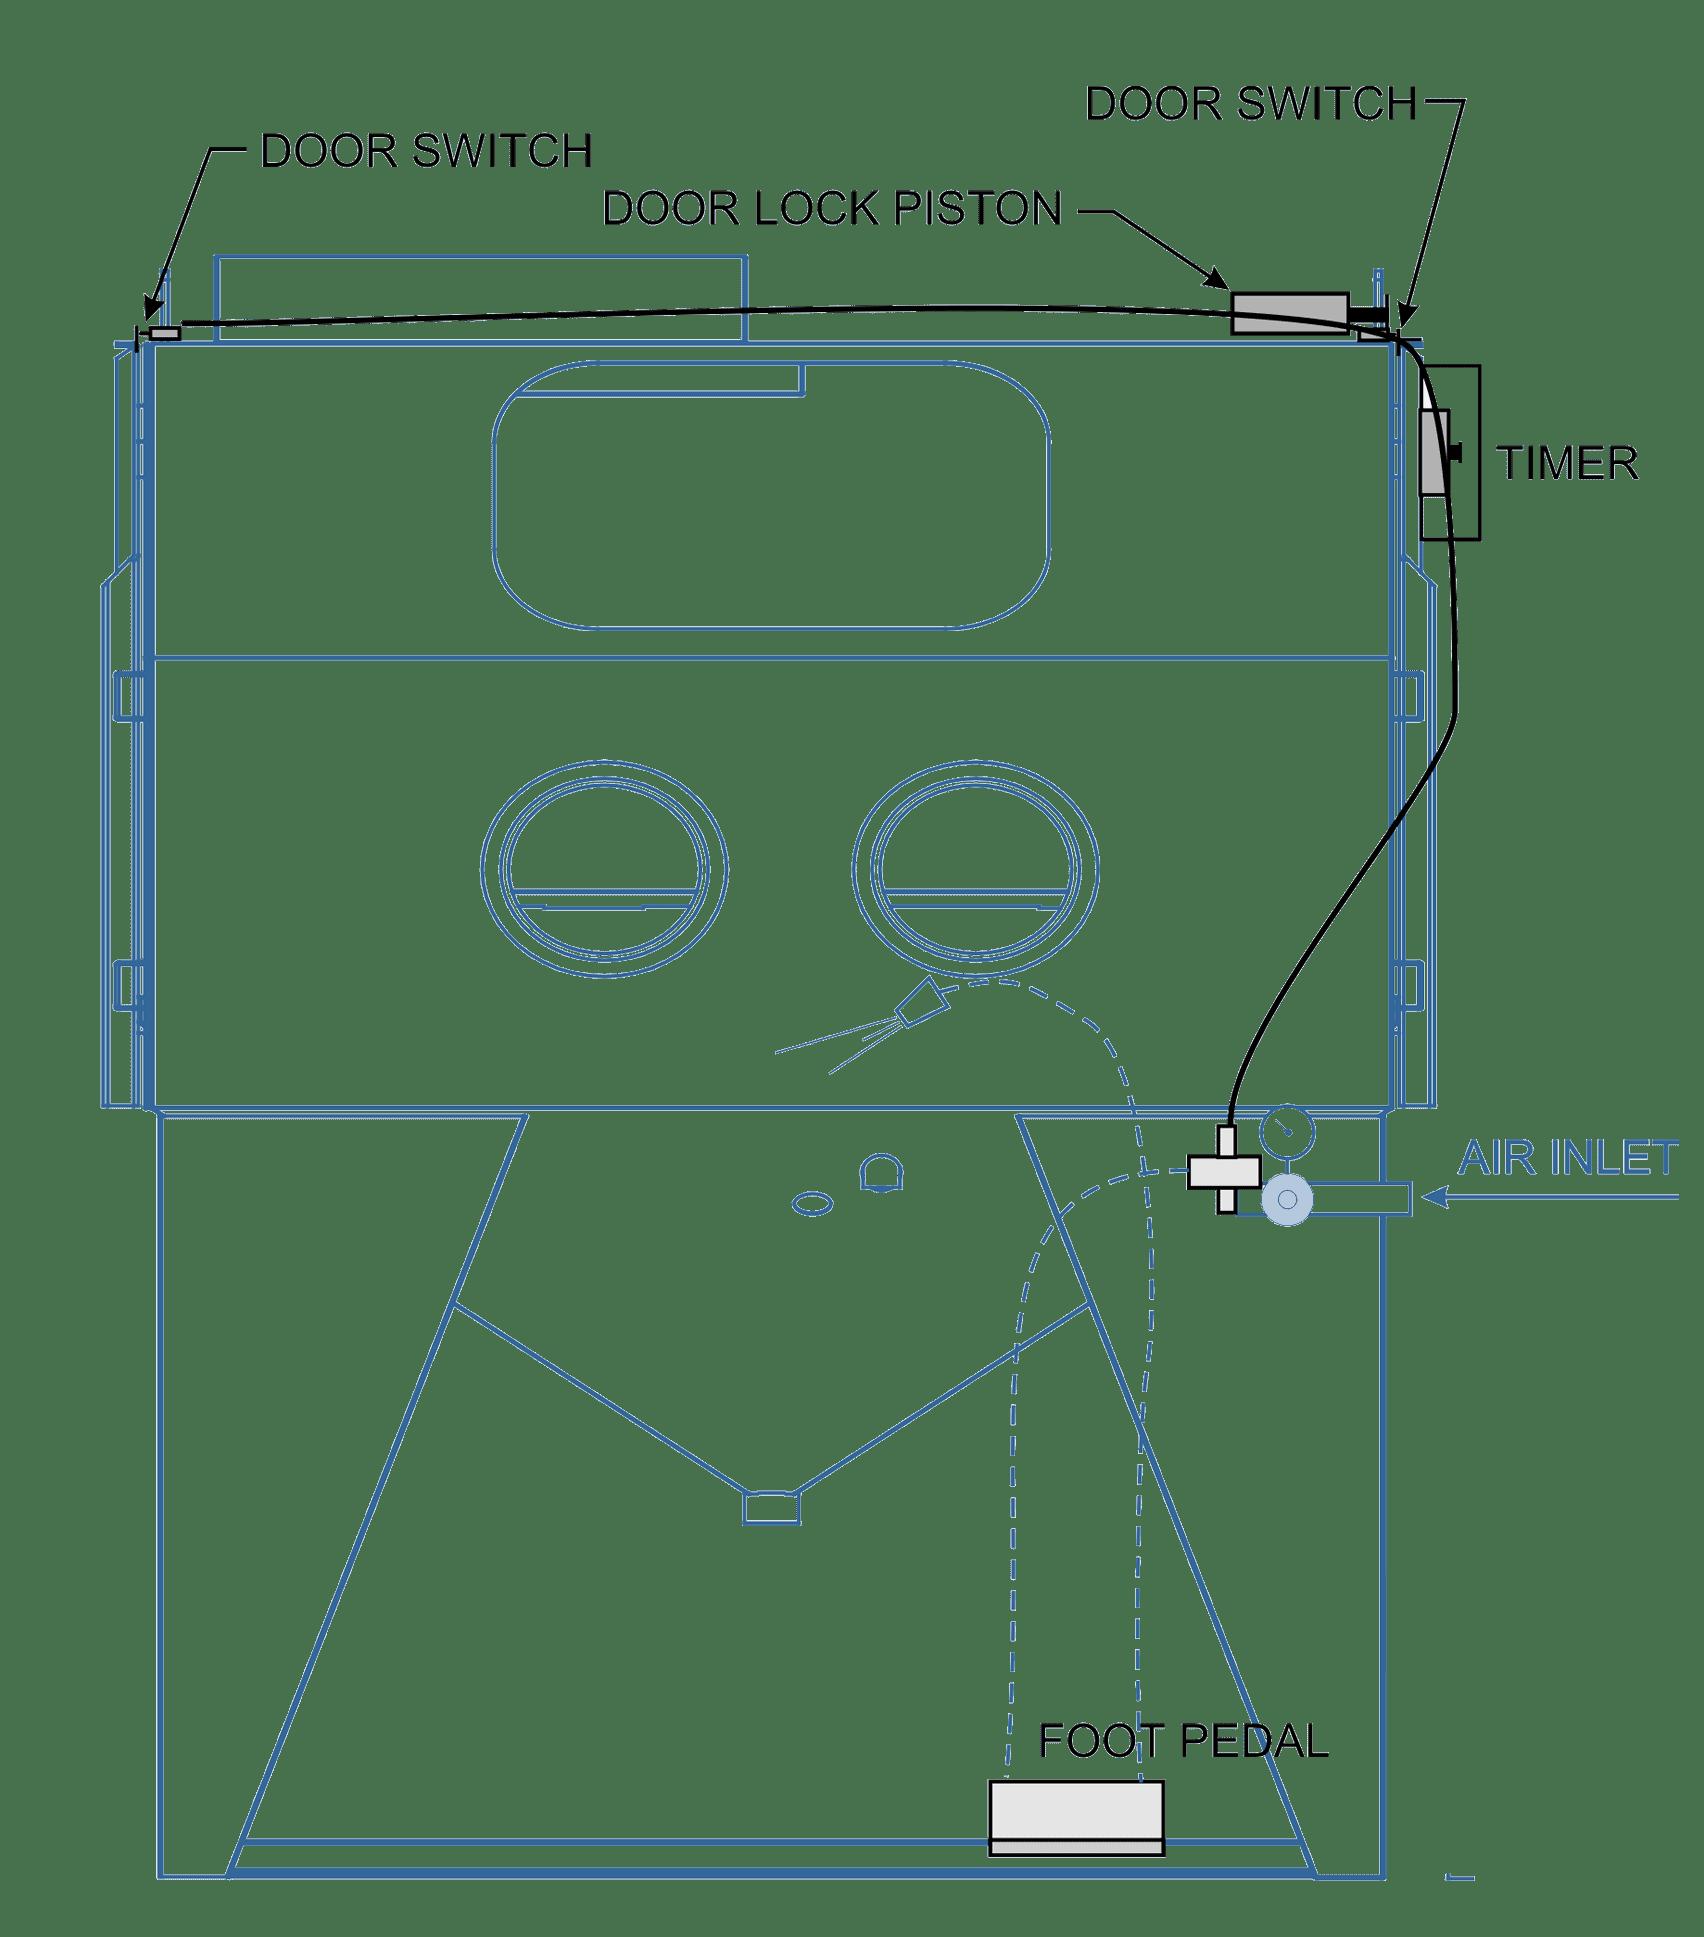 cabinet door diagram kicker l5 sub wiring sandblast security options accessories option for sandblasting